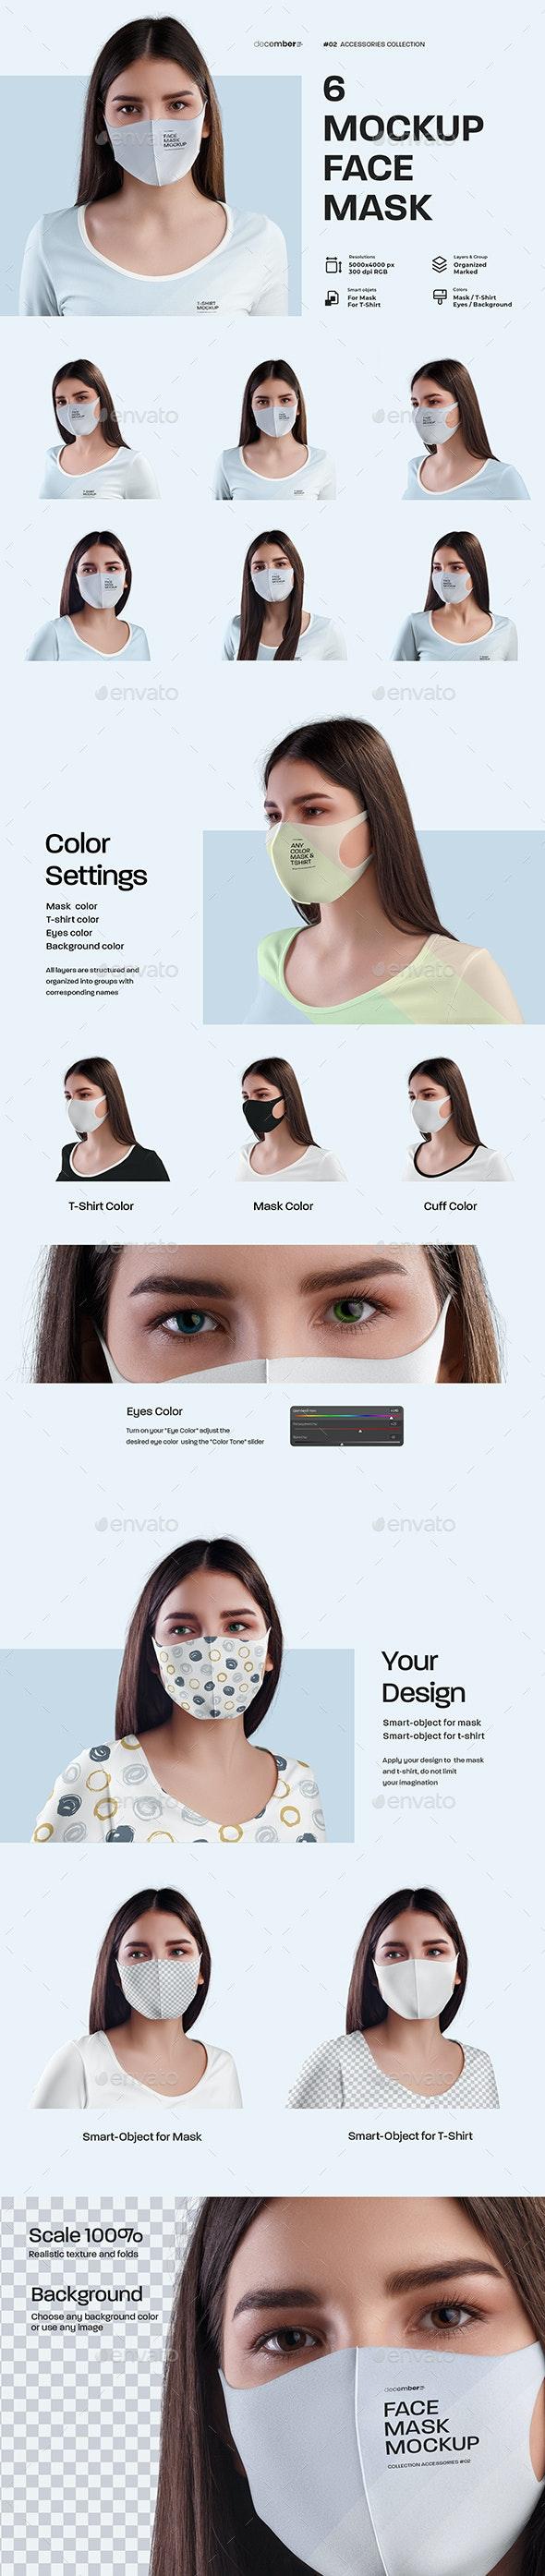 6 Mockups Face Mask - Apparel Product Mock-Ups